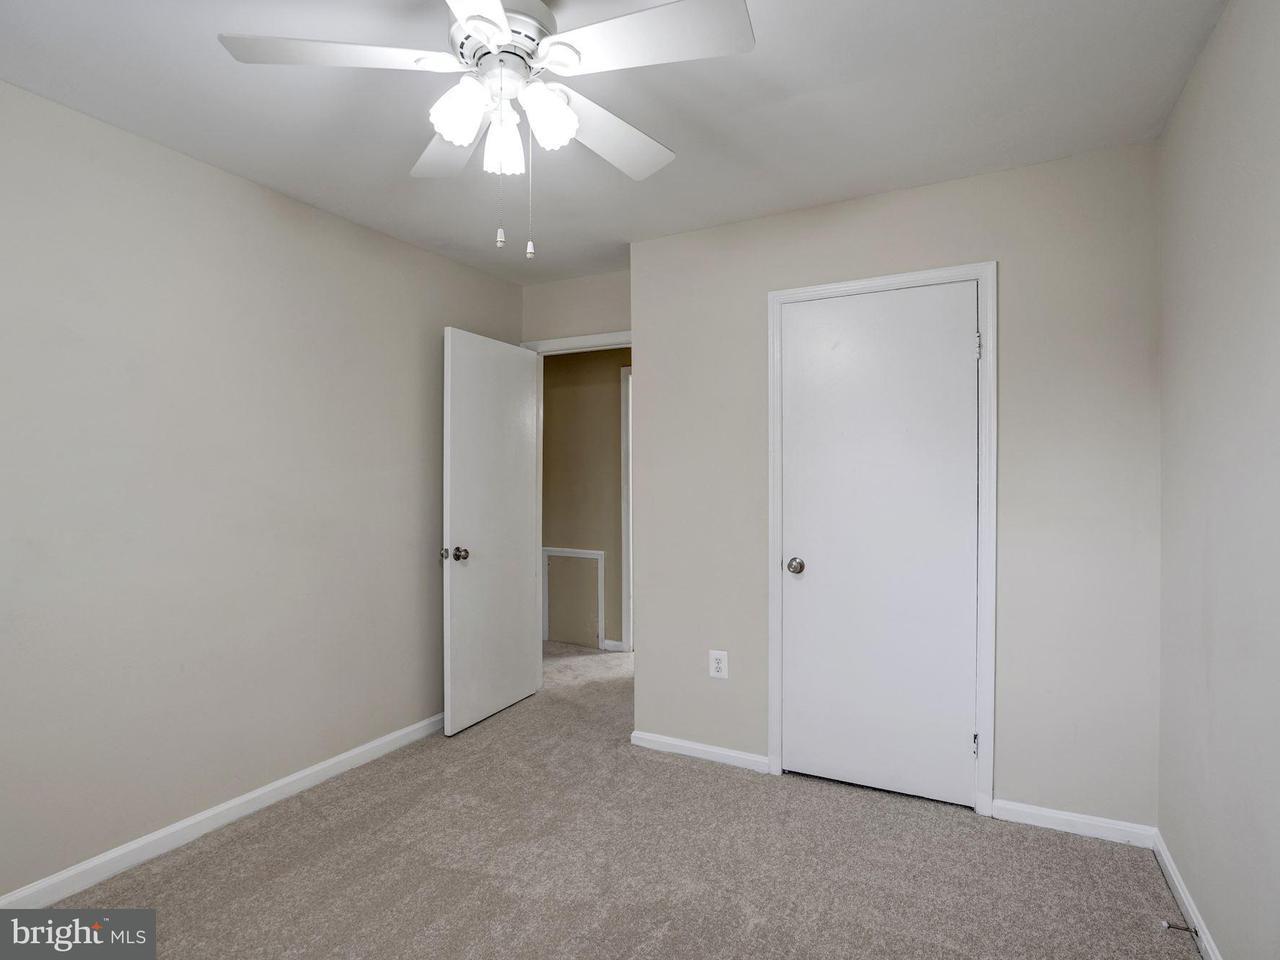 Additional photo for property listing at 2757 Blocker Place 2757 Blocker Place Falls Church, Virginia 22043 Stati Uniti